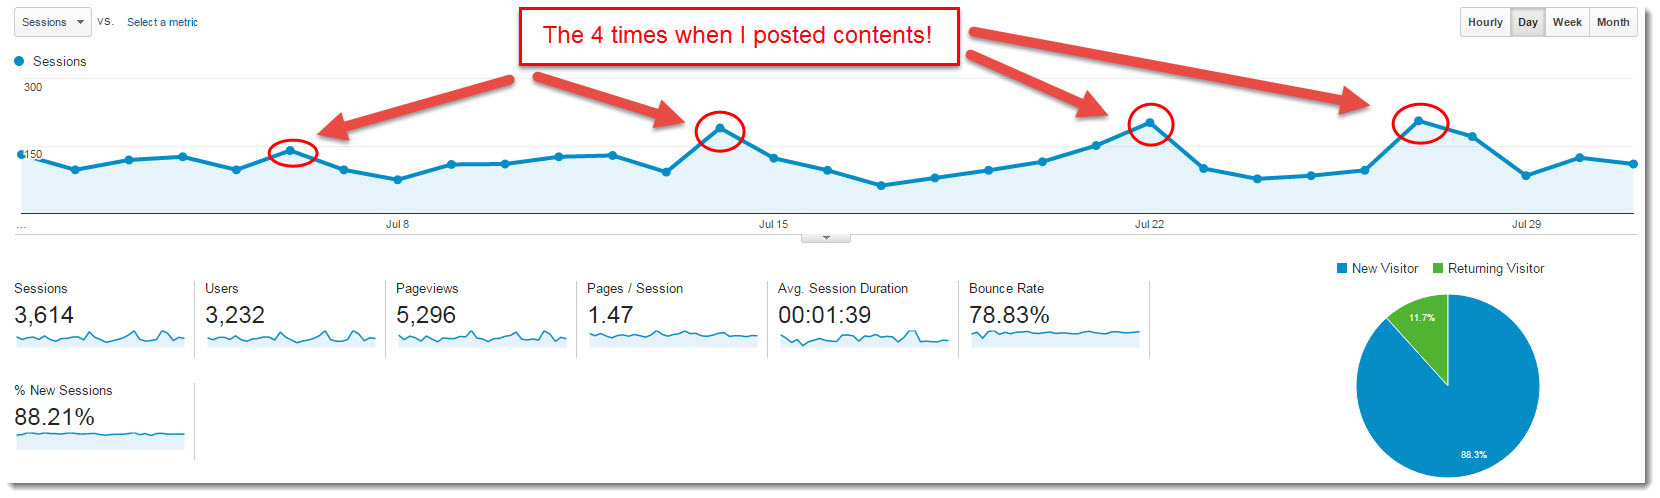 My internet Quest July 2015 Google Analytics